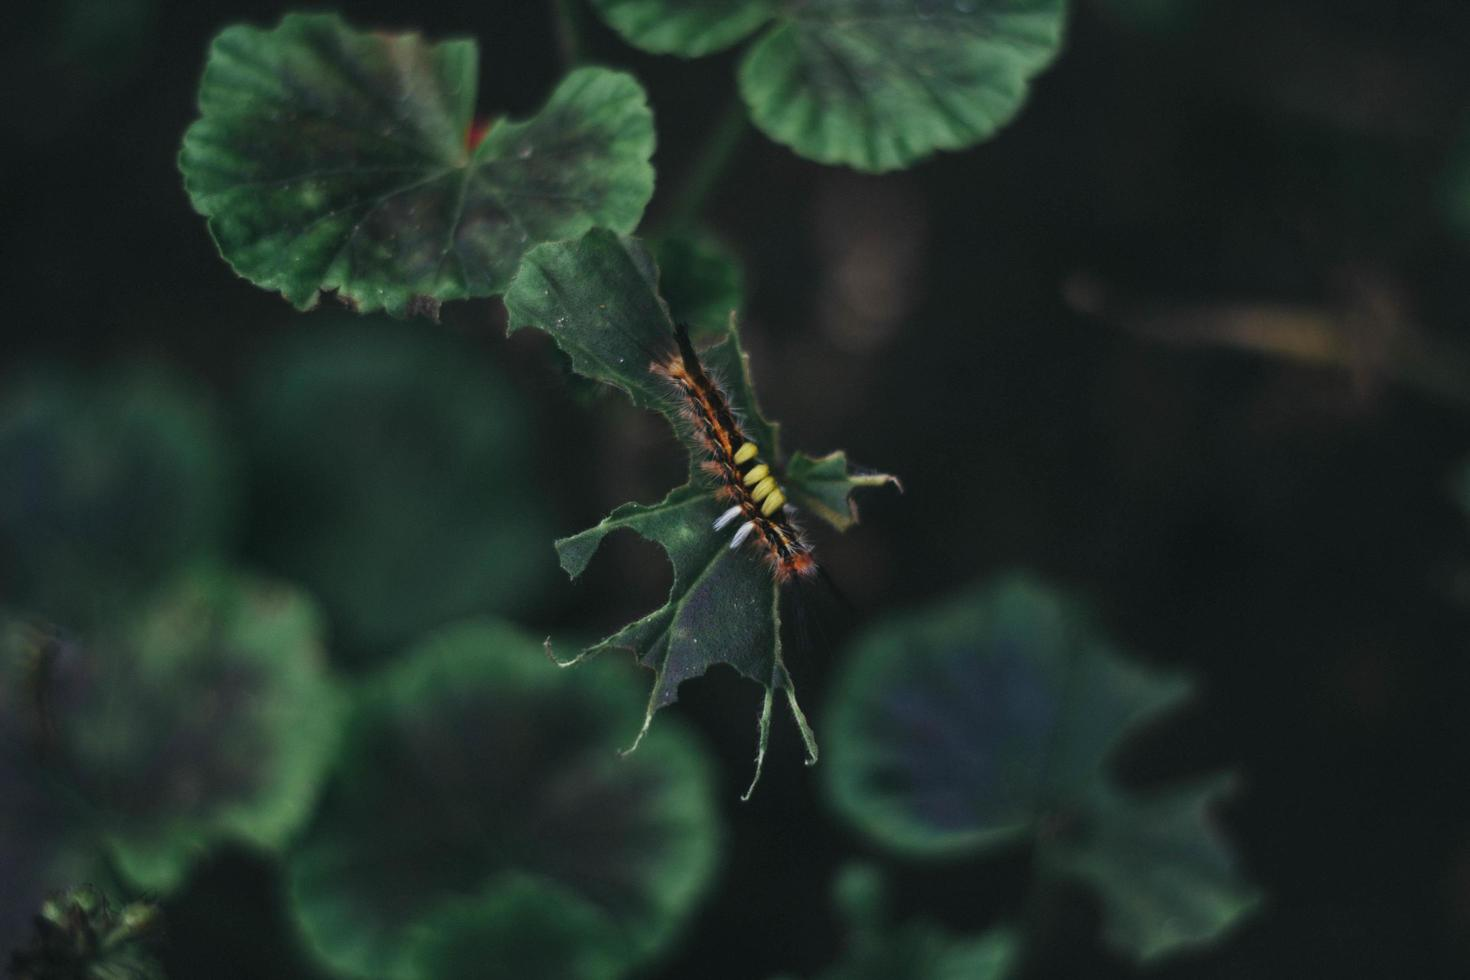 Caterpillar on a leaf photo